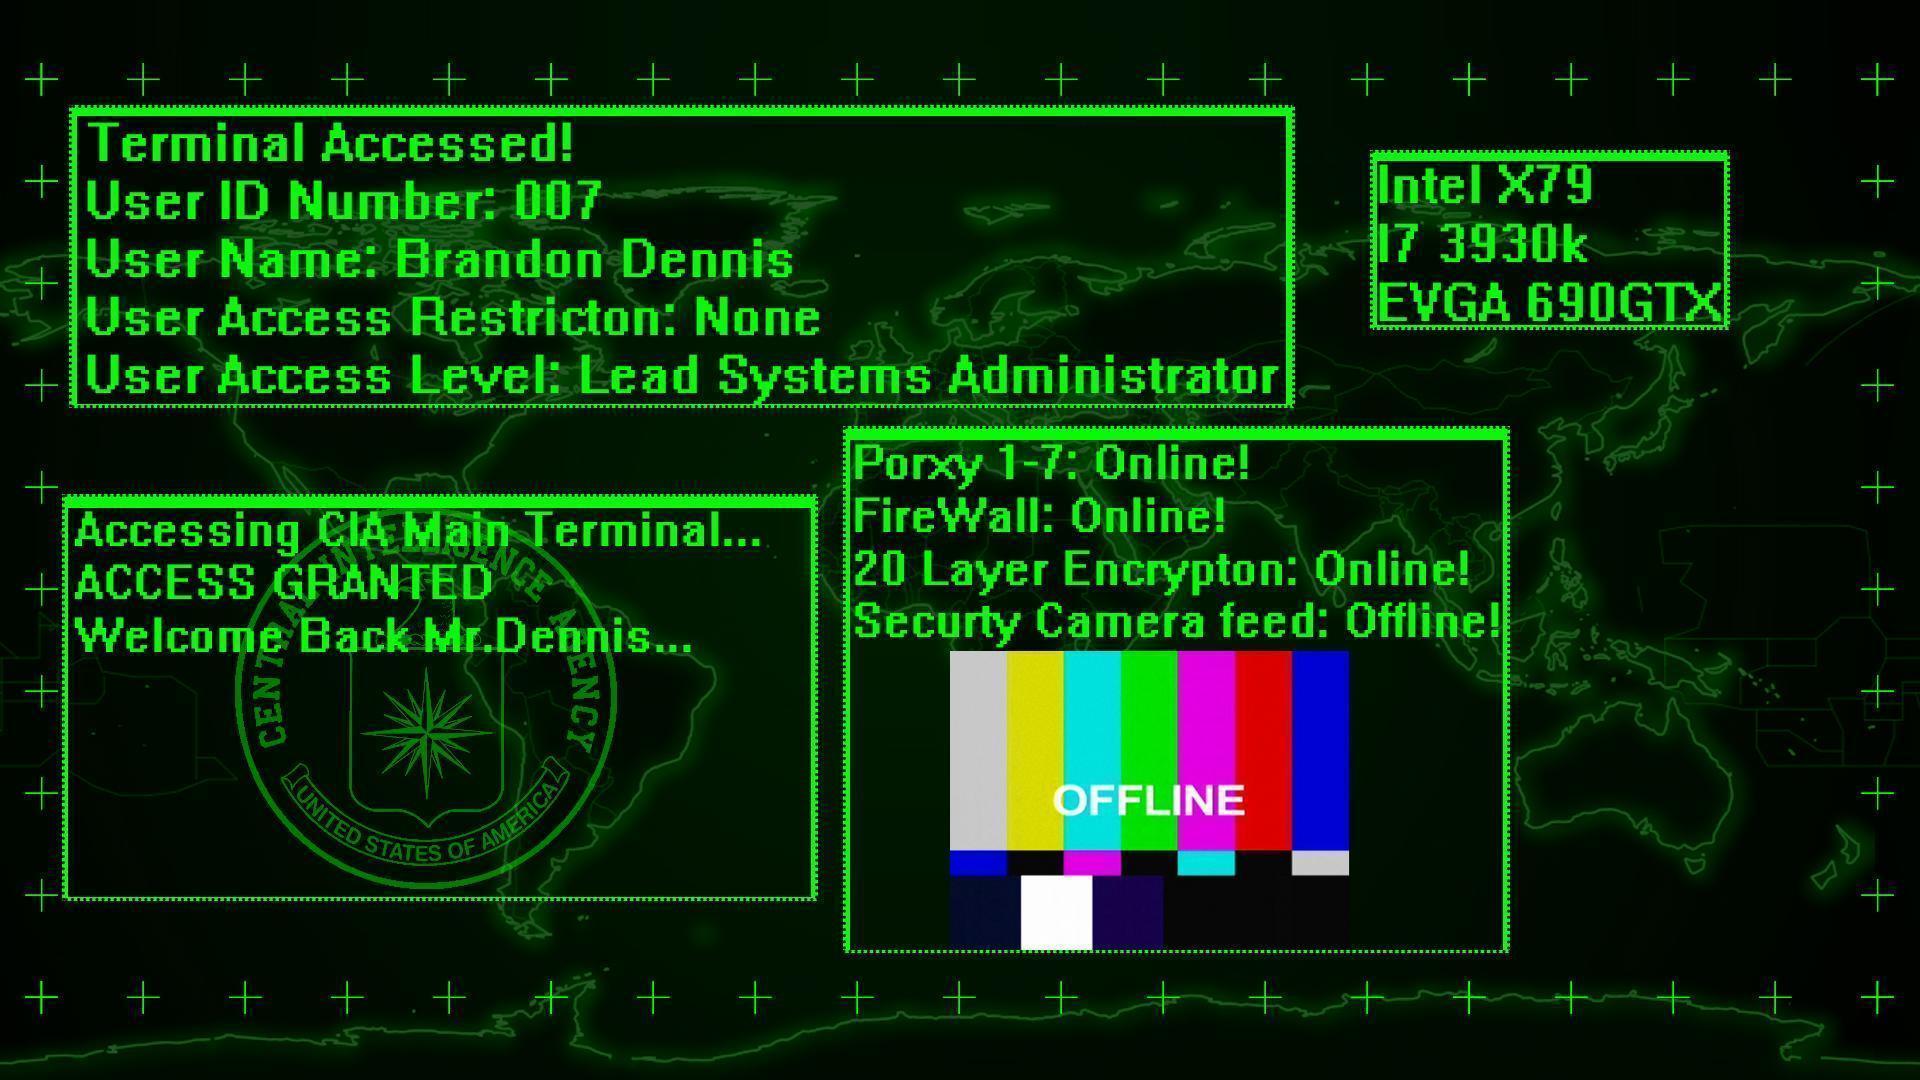 hacker wallpaper 1920x1080 - photo #11